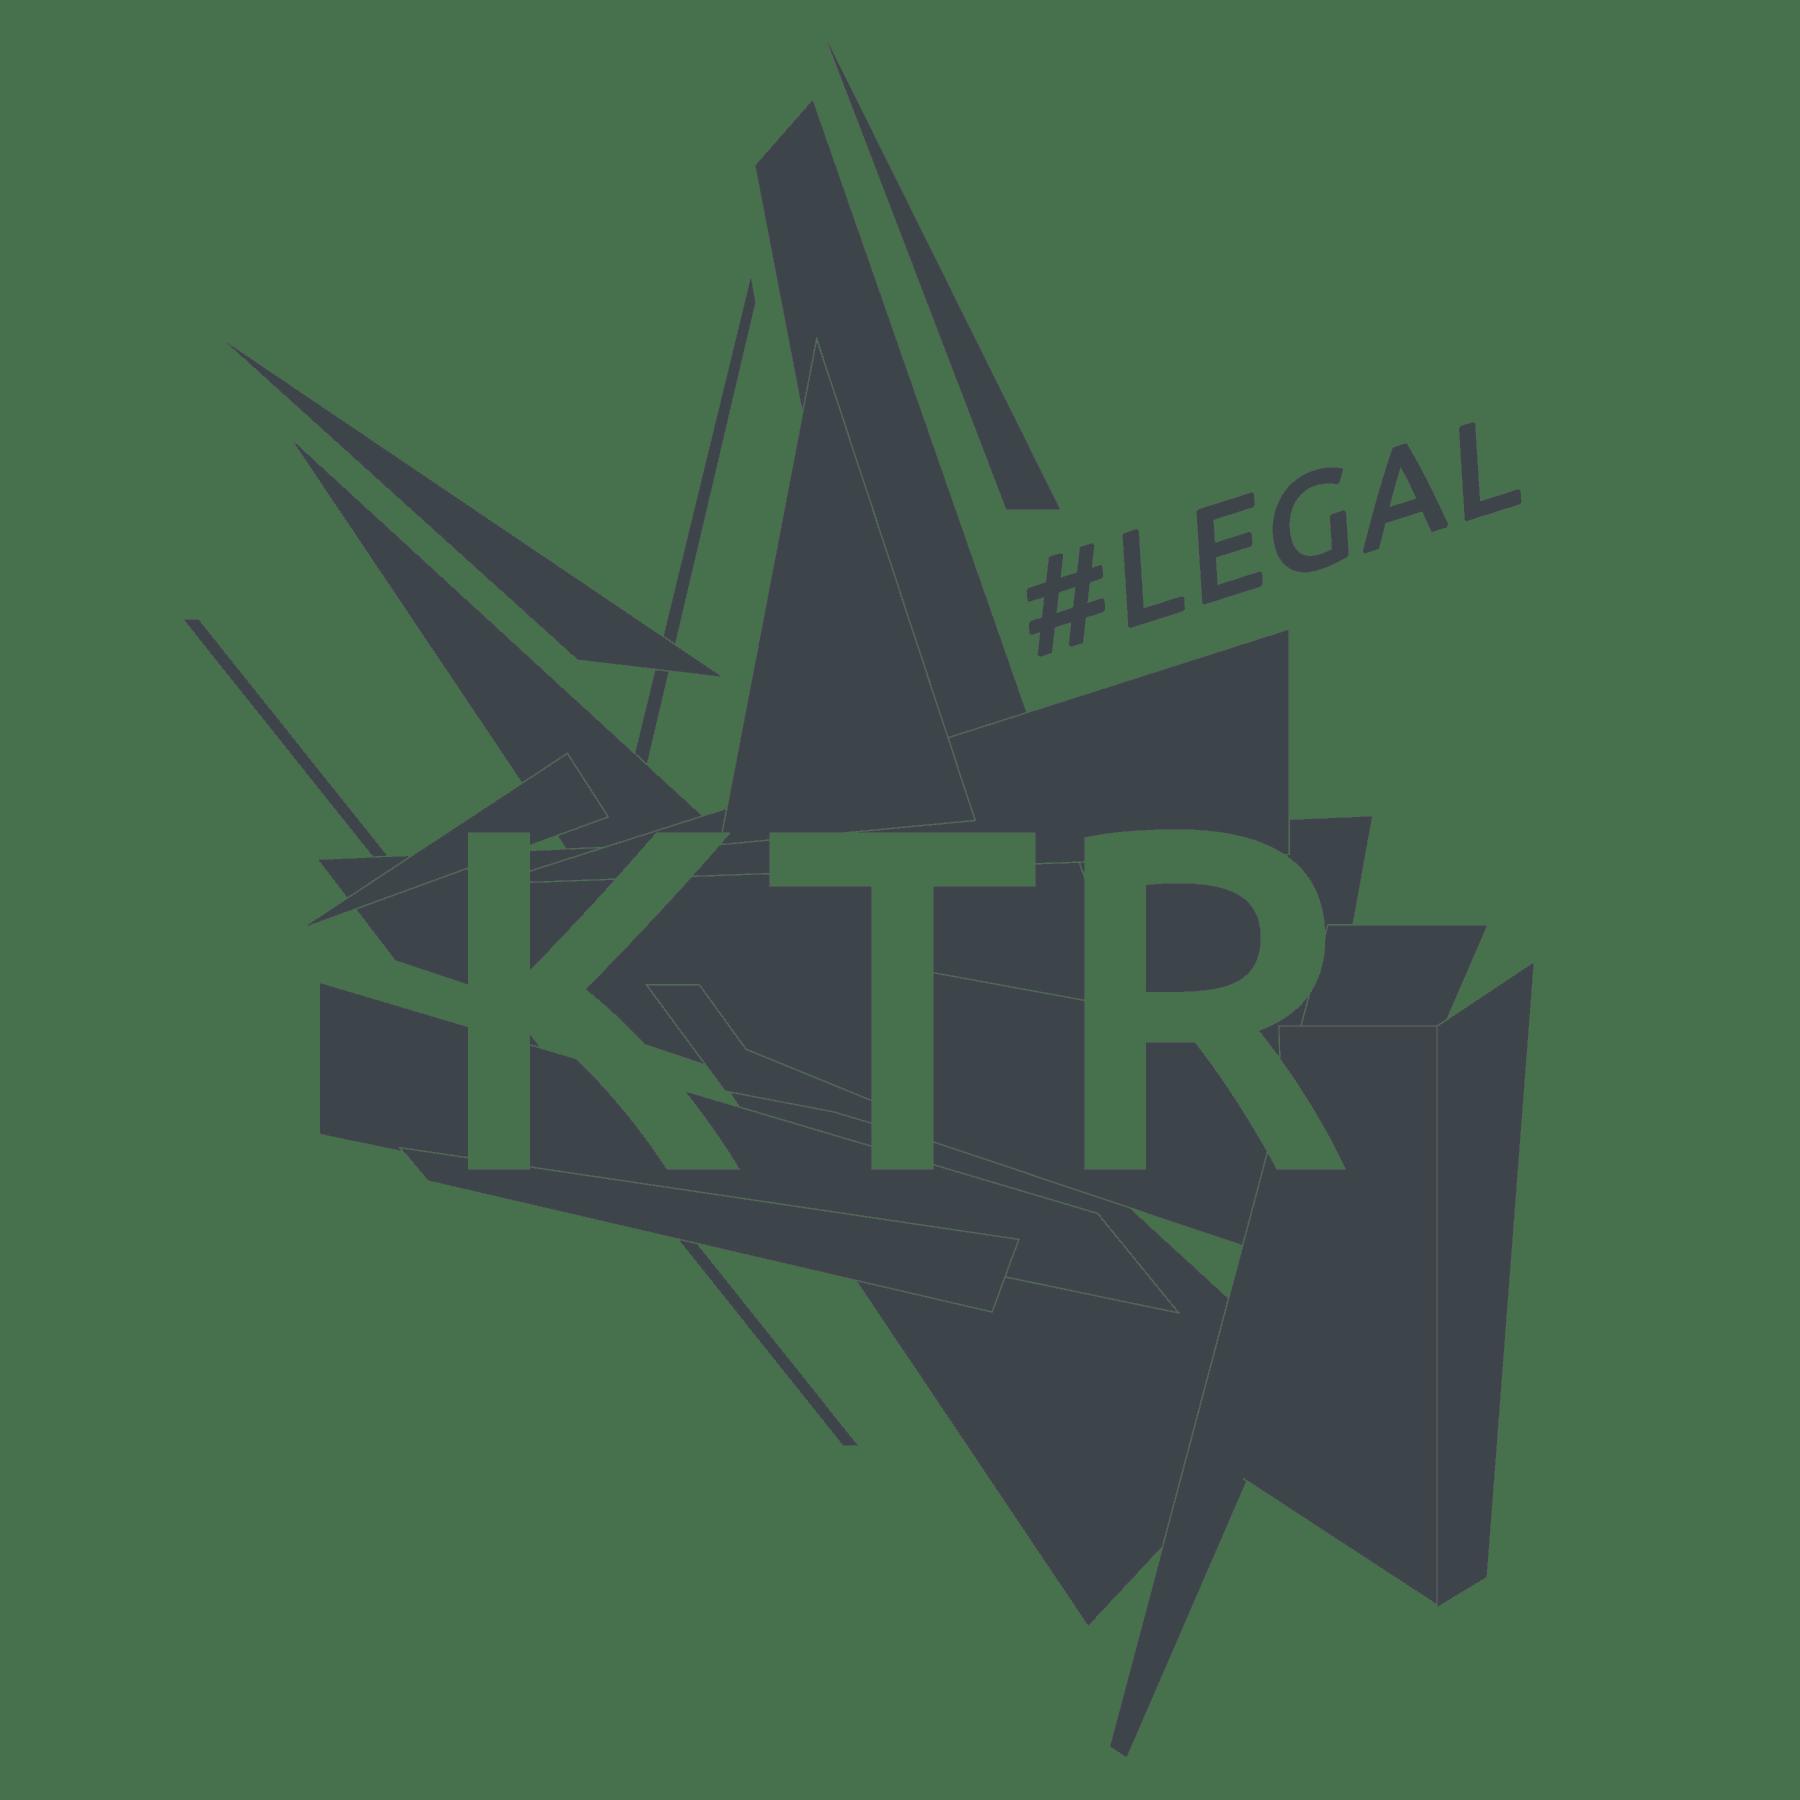 KTR.legal coworking